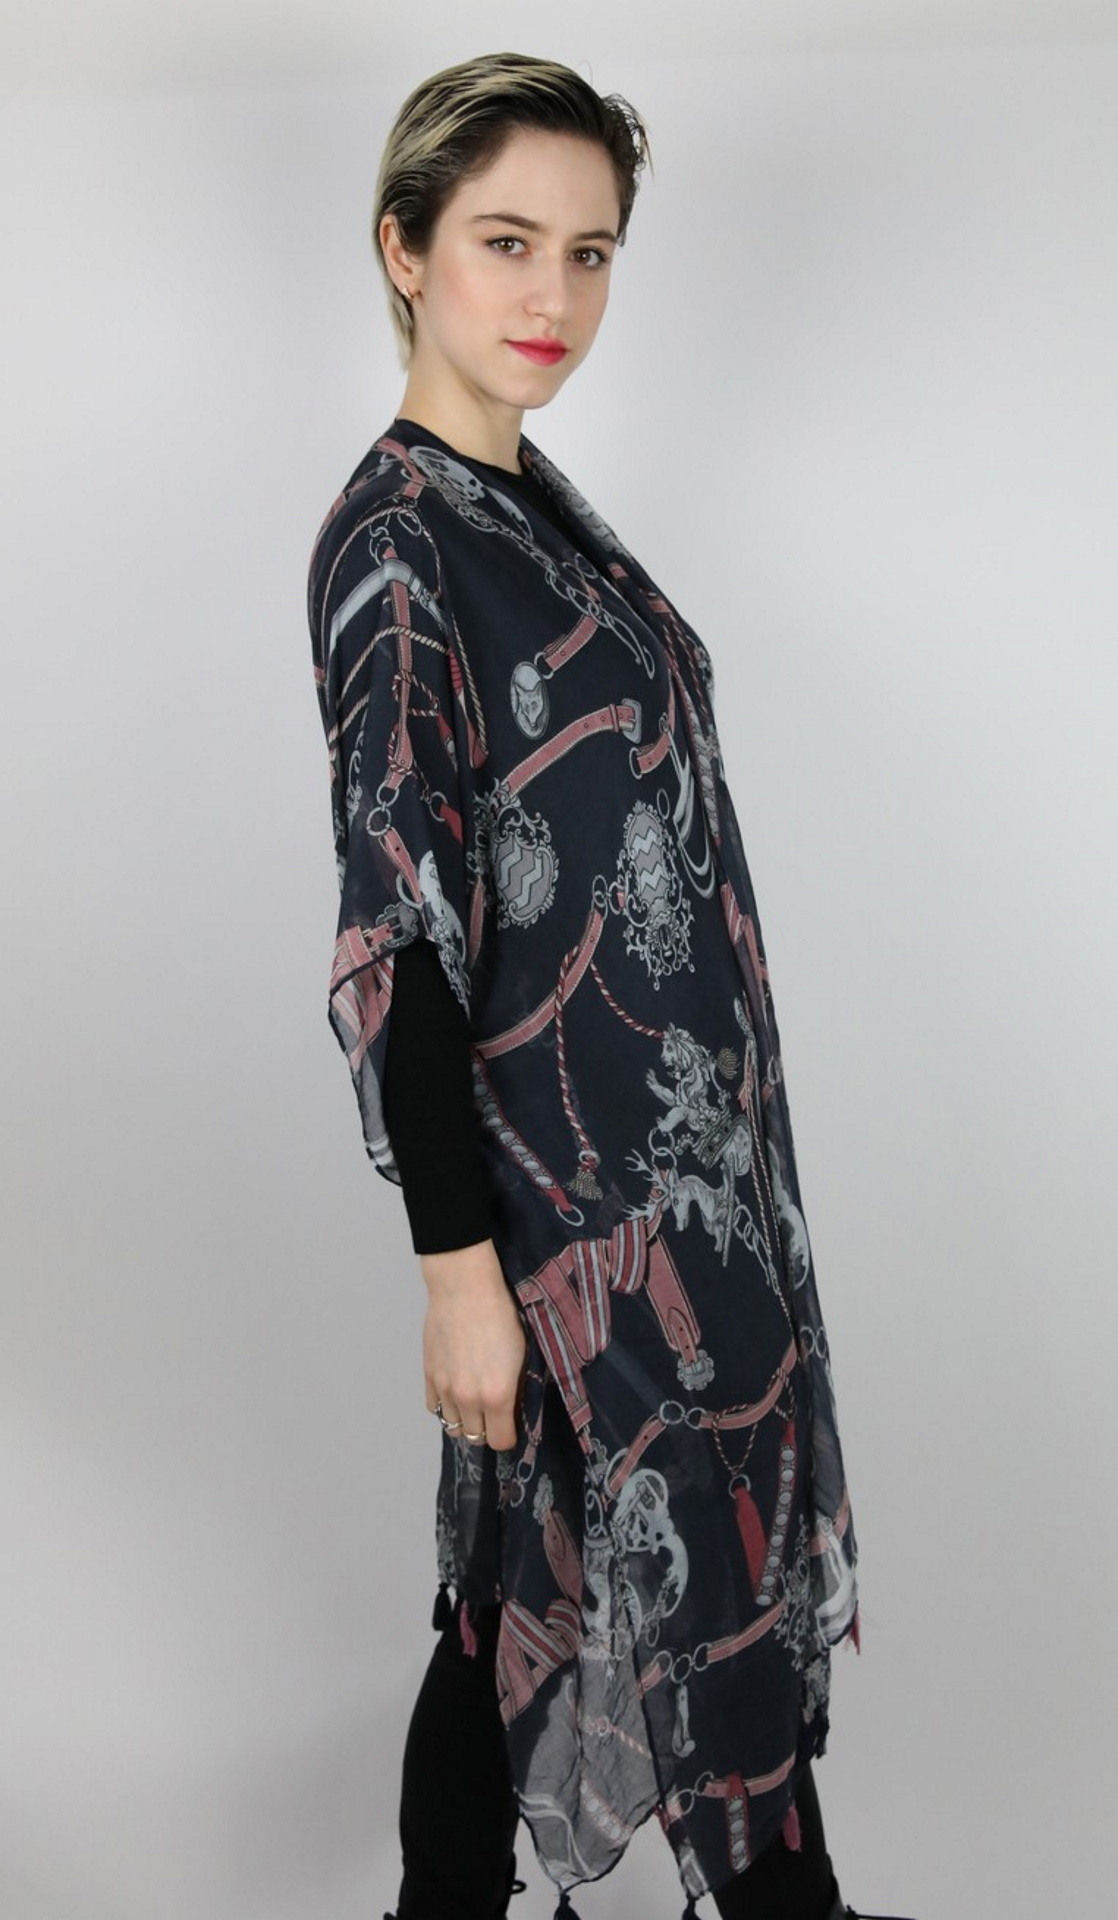 CLOTHES09 STOLA DONNA FOULARD CARDIGAN COPRISPALLE 3 1stAmerican elegante stola da donna foulard cardigan coprispalle